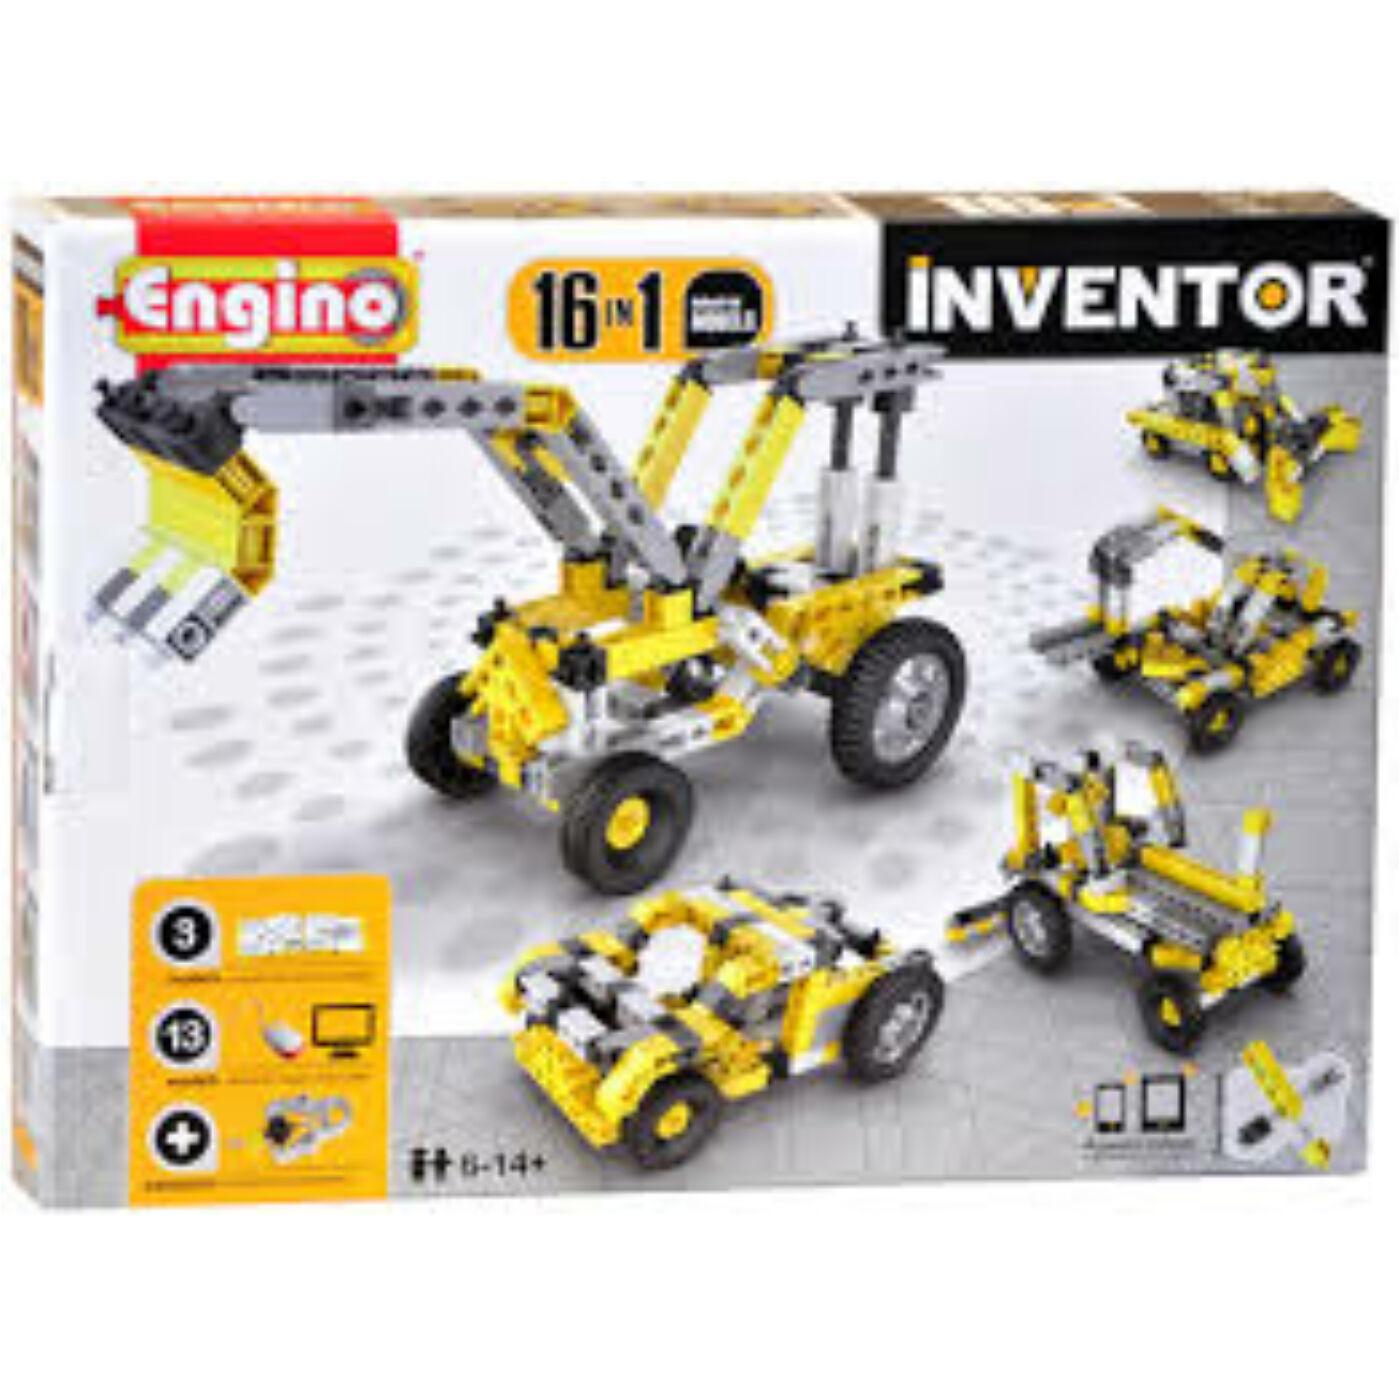 Engino Inventor munkagépek 16in1